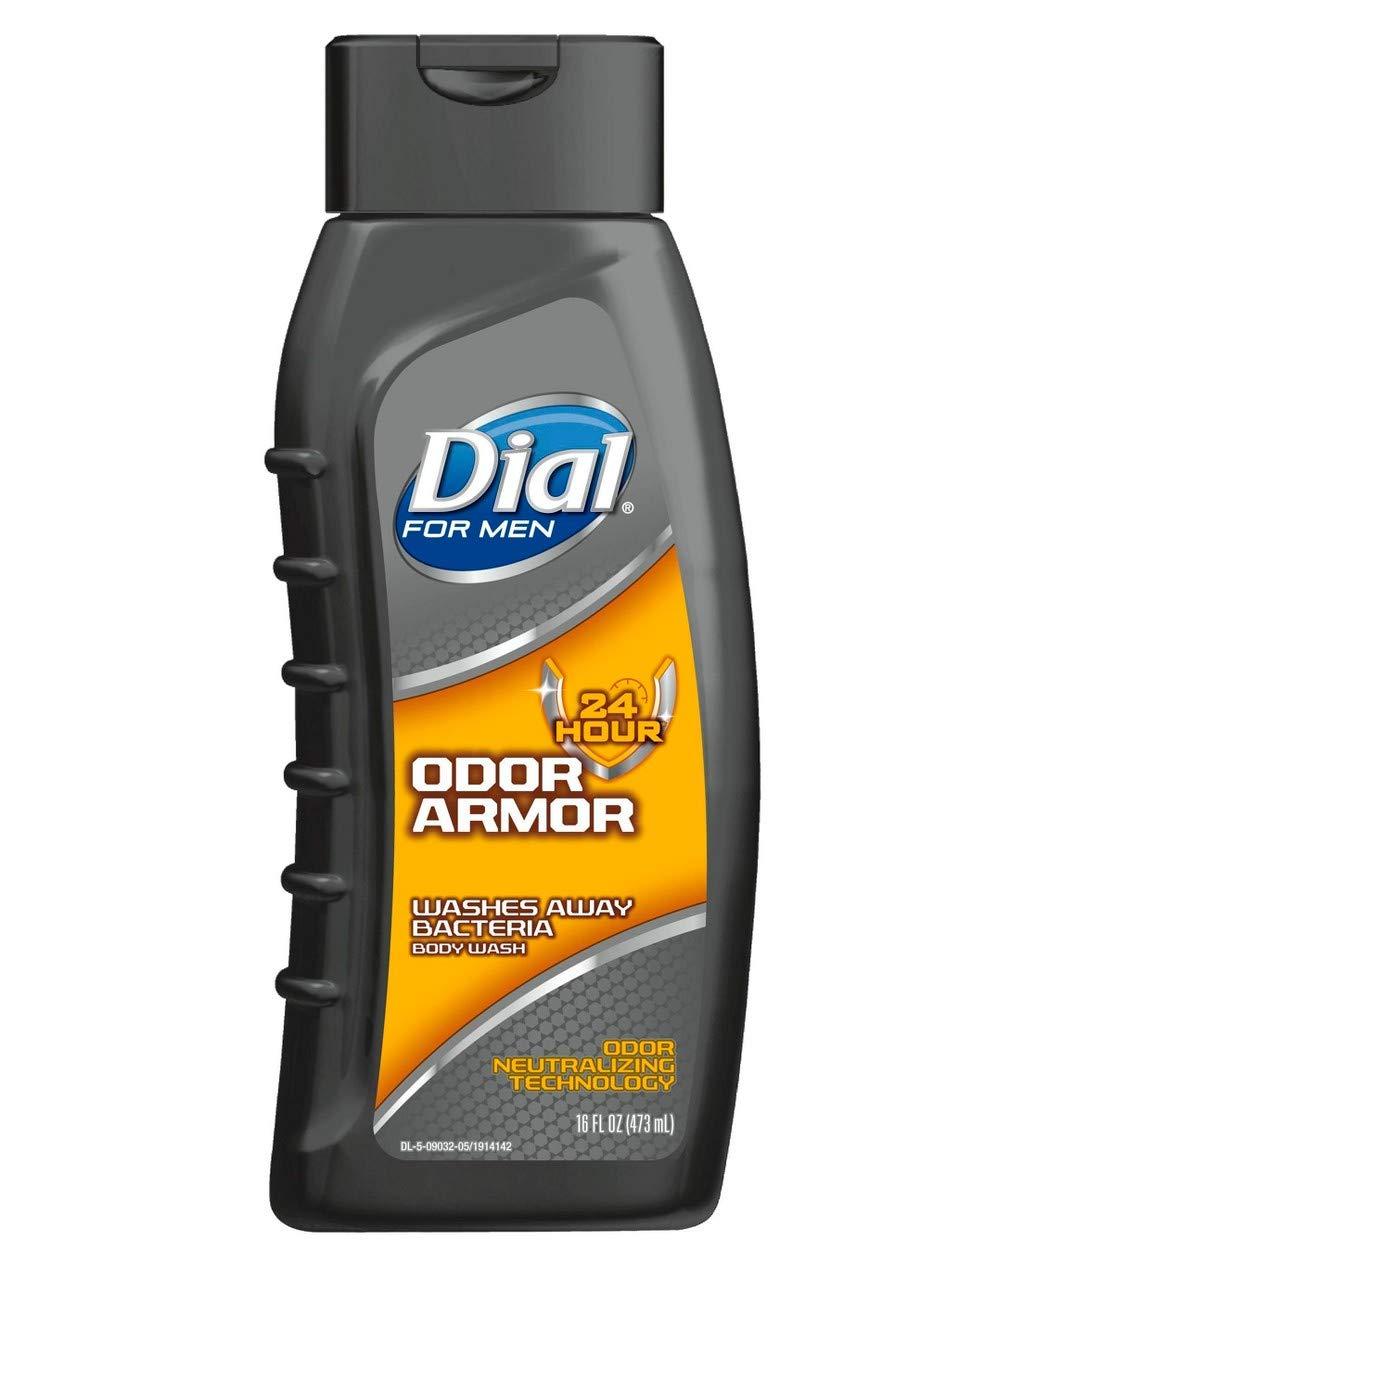 Dial For Men Antibacterial Body Wash, Odor Armor 16 oz